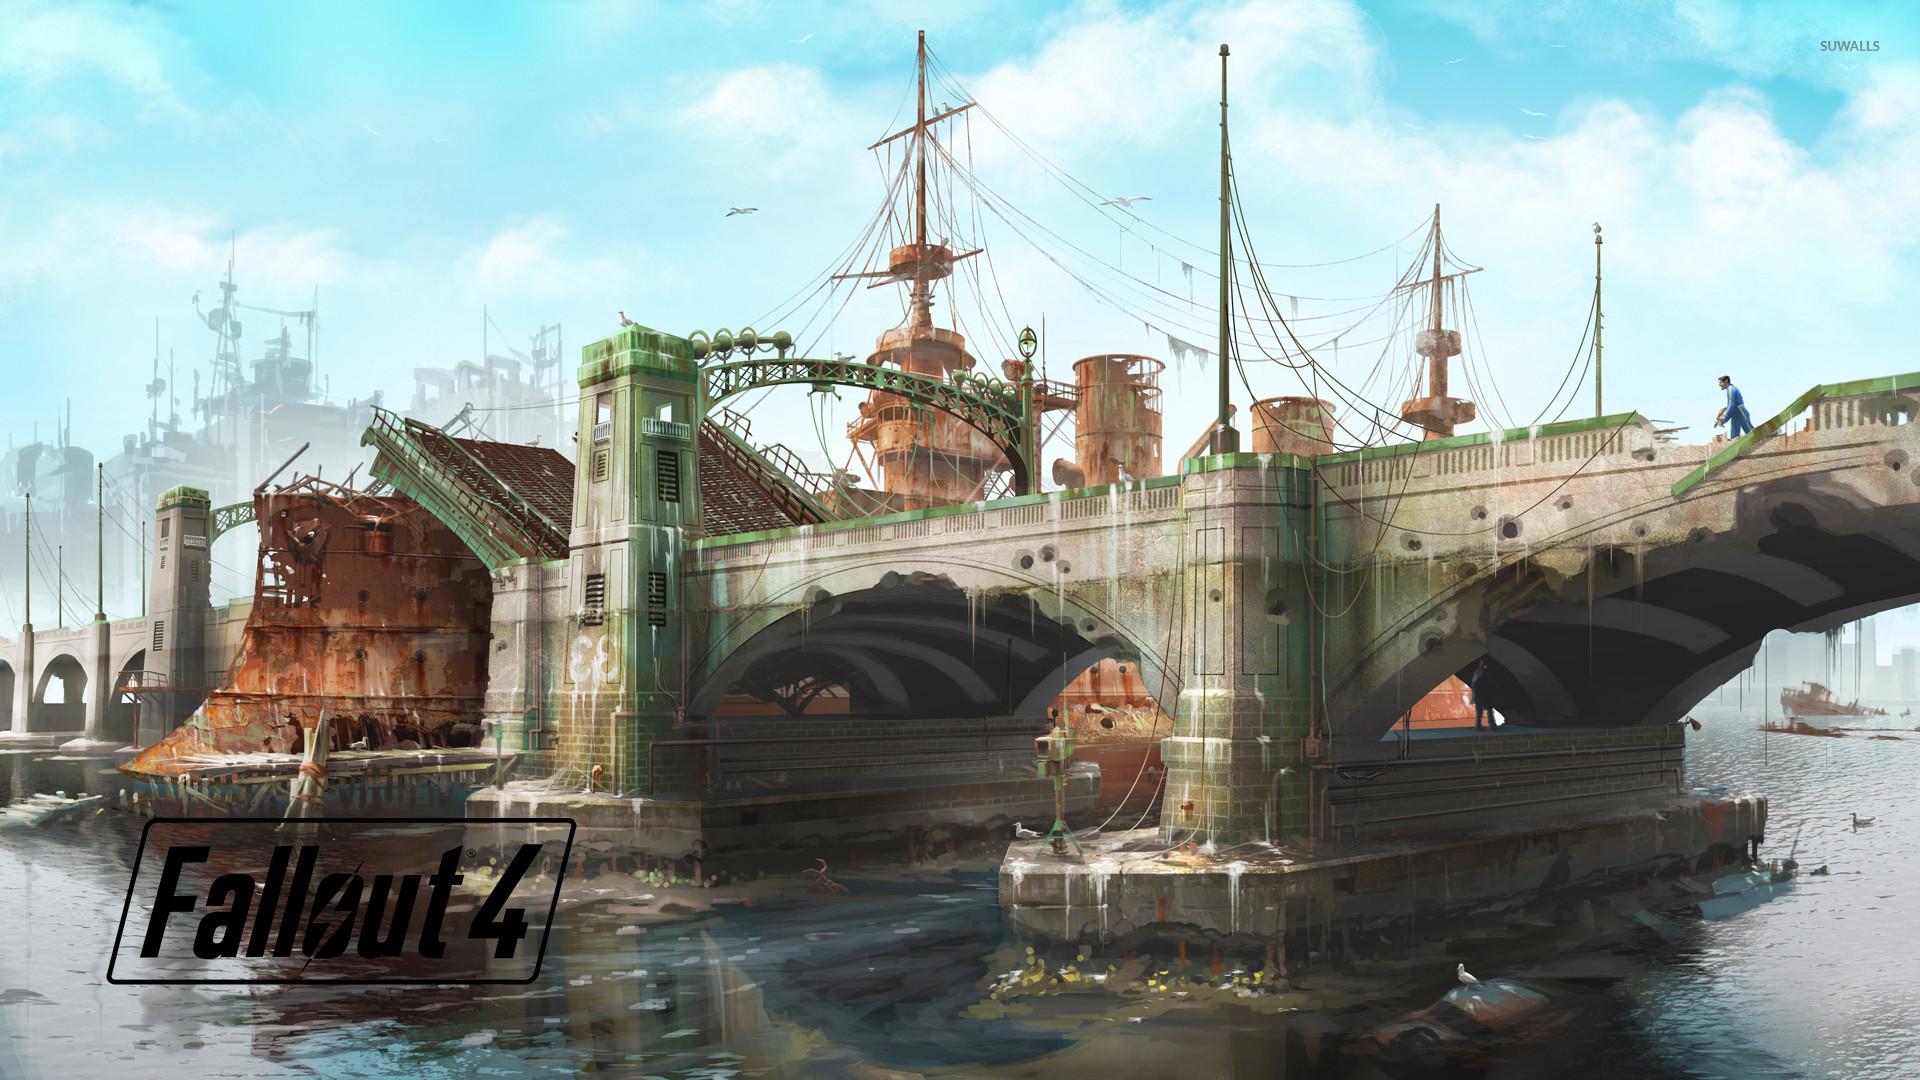 Fallout 4 bridge wallpaper jpg